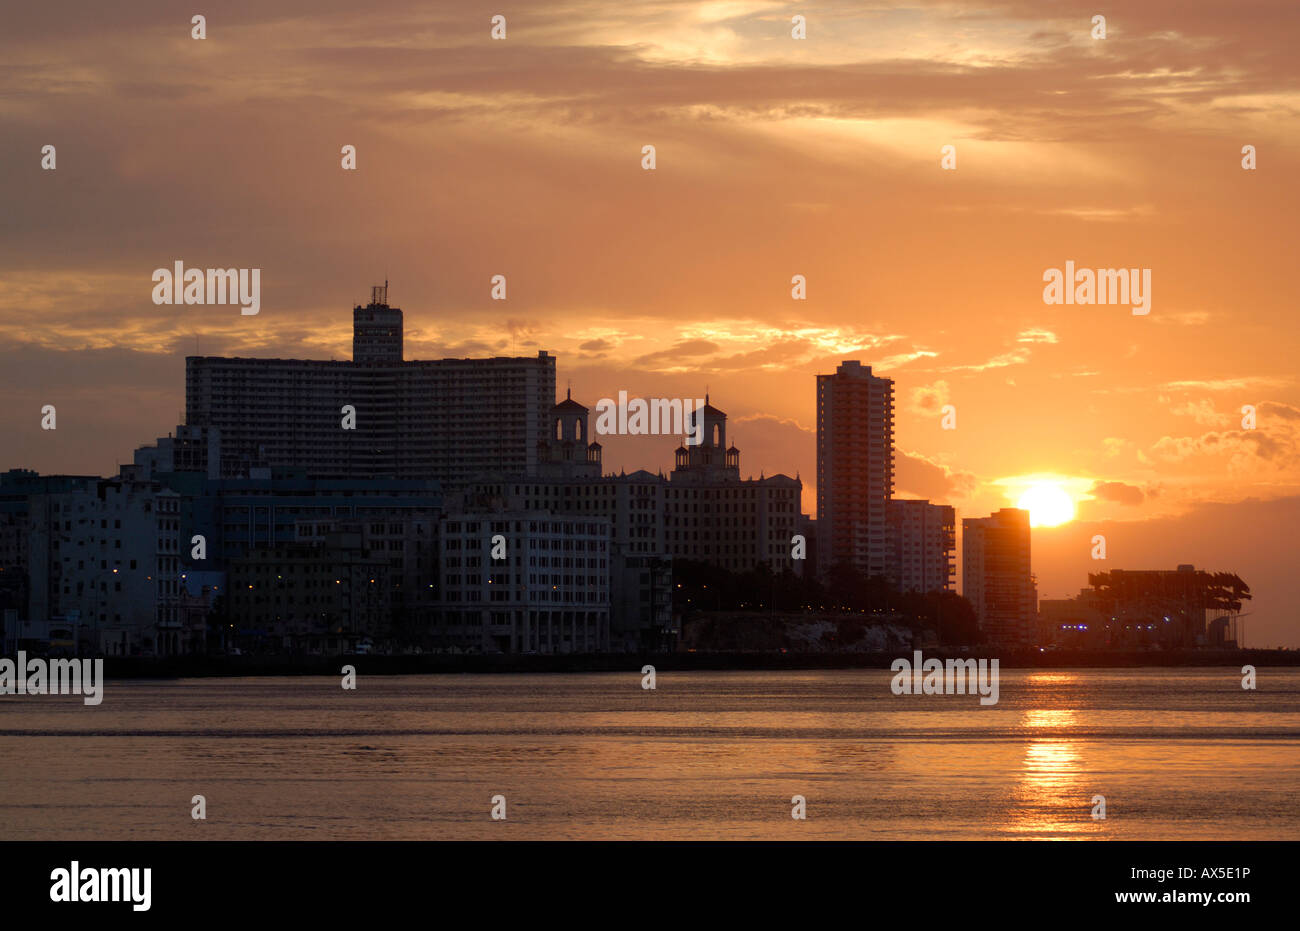 Sunset at the Malecón, Havana Libre Hotel and Hotel Nacional, Havana, Cuba, Caribbean - Stock Image